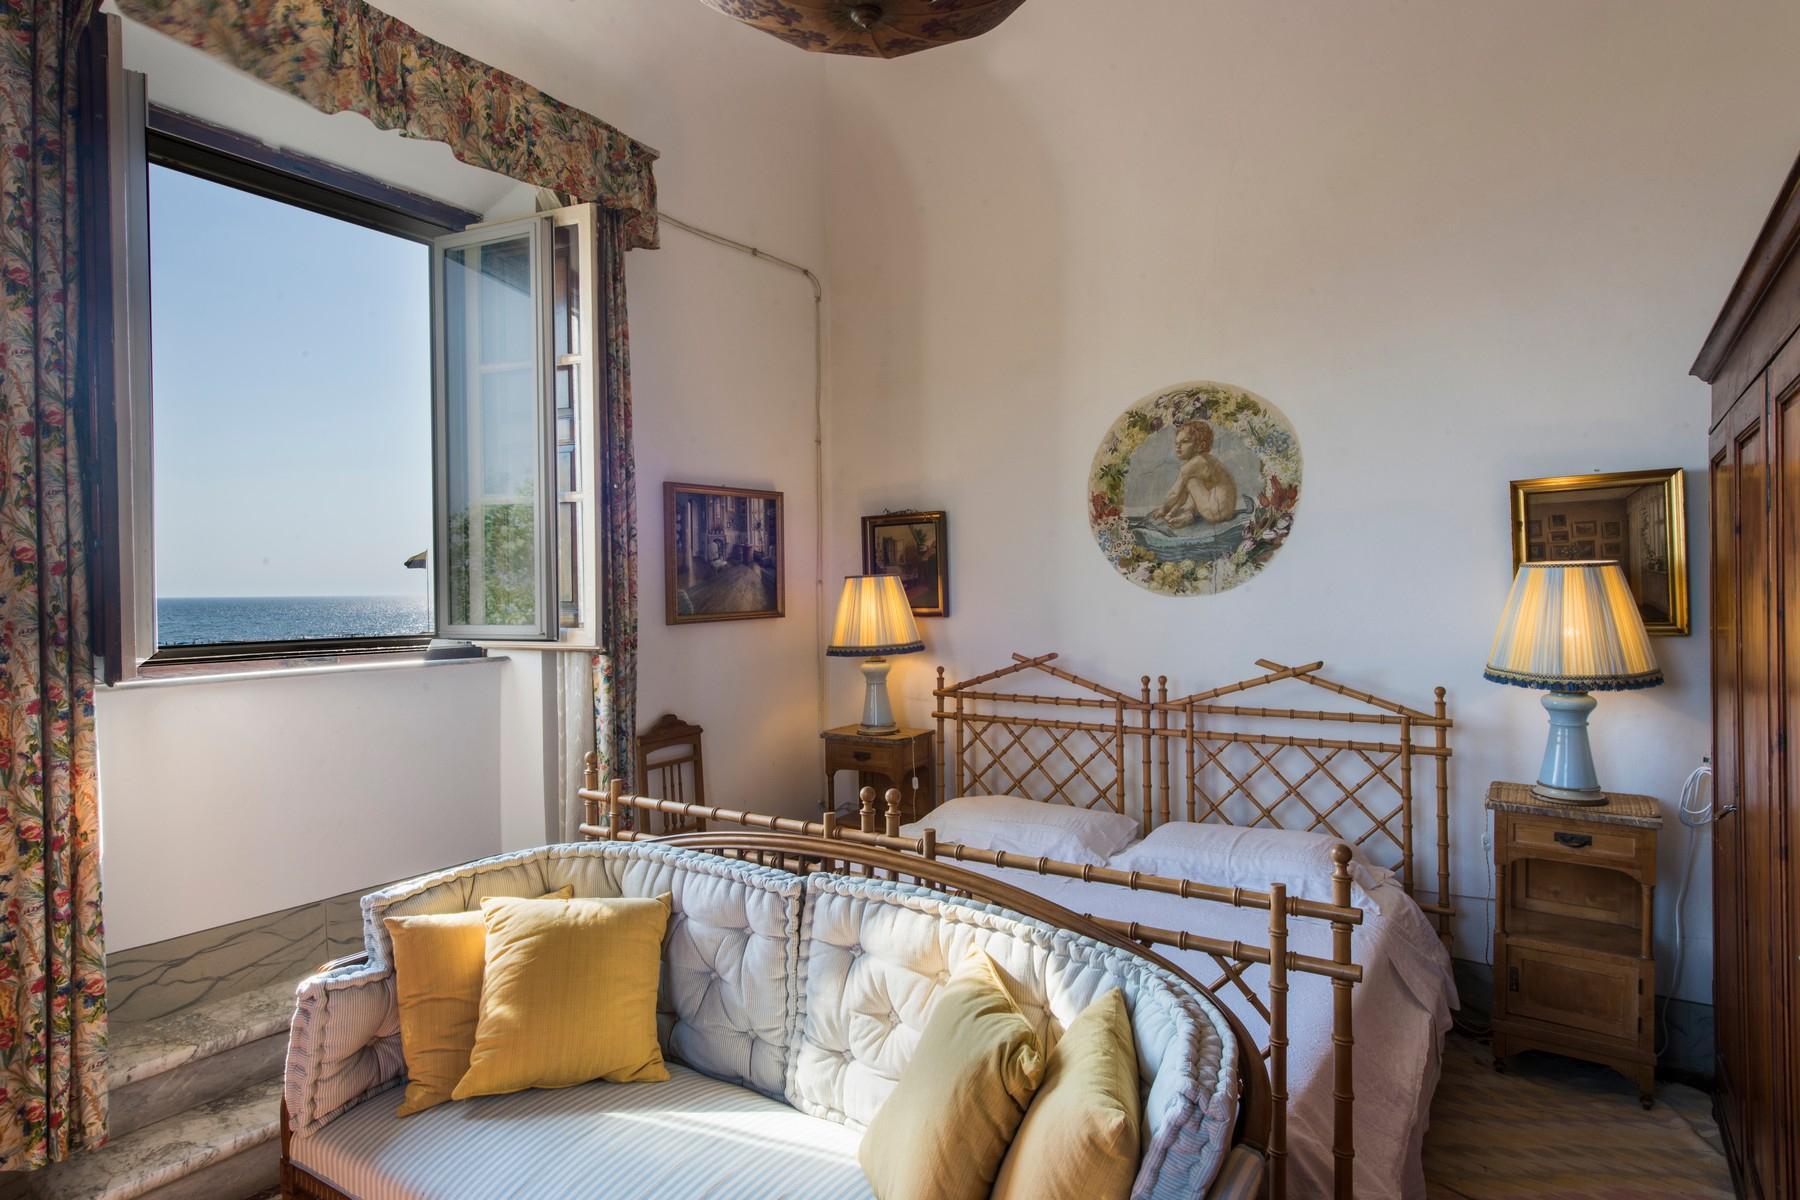 Villa historique en bord de mer à Forte dei Marmi - 23